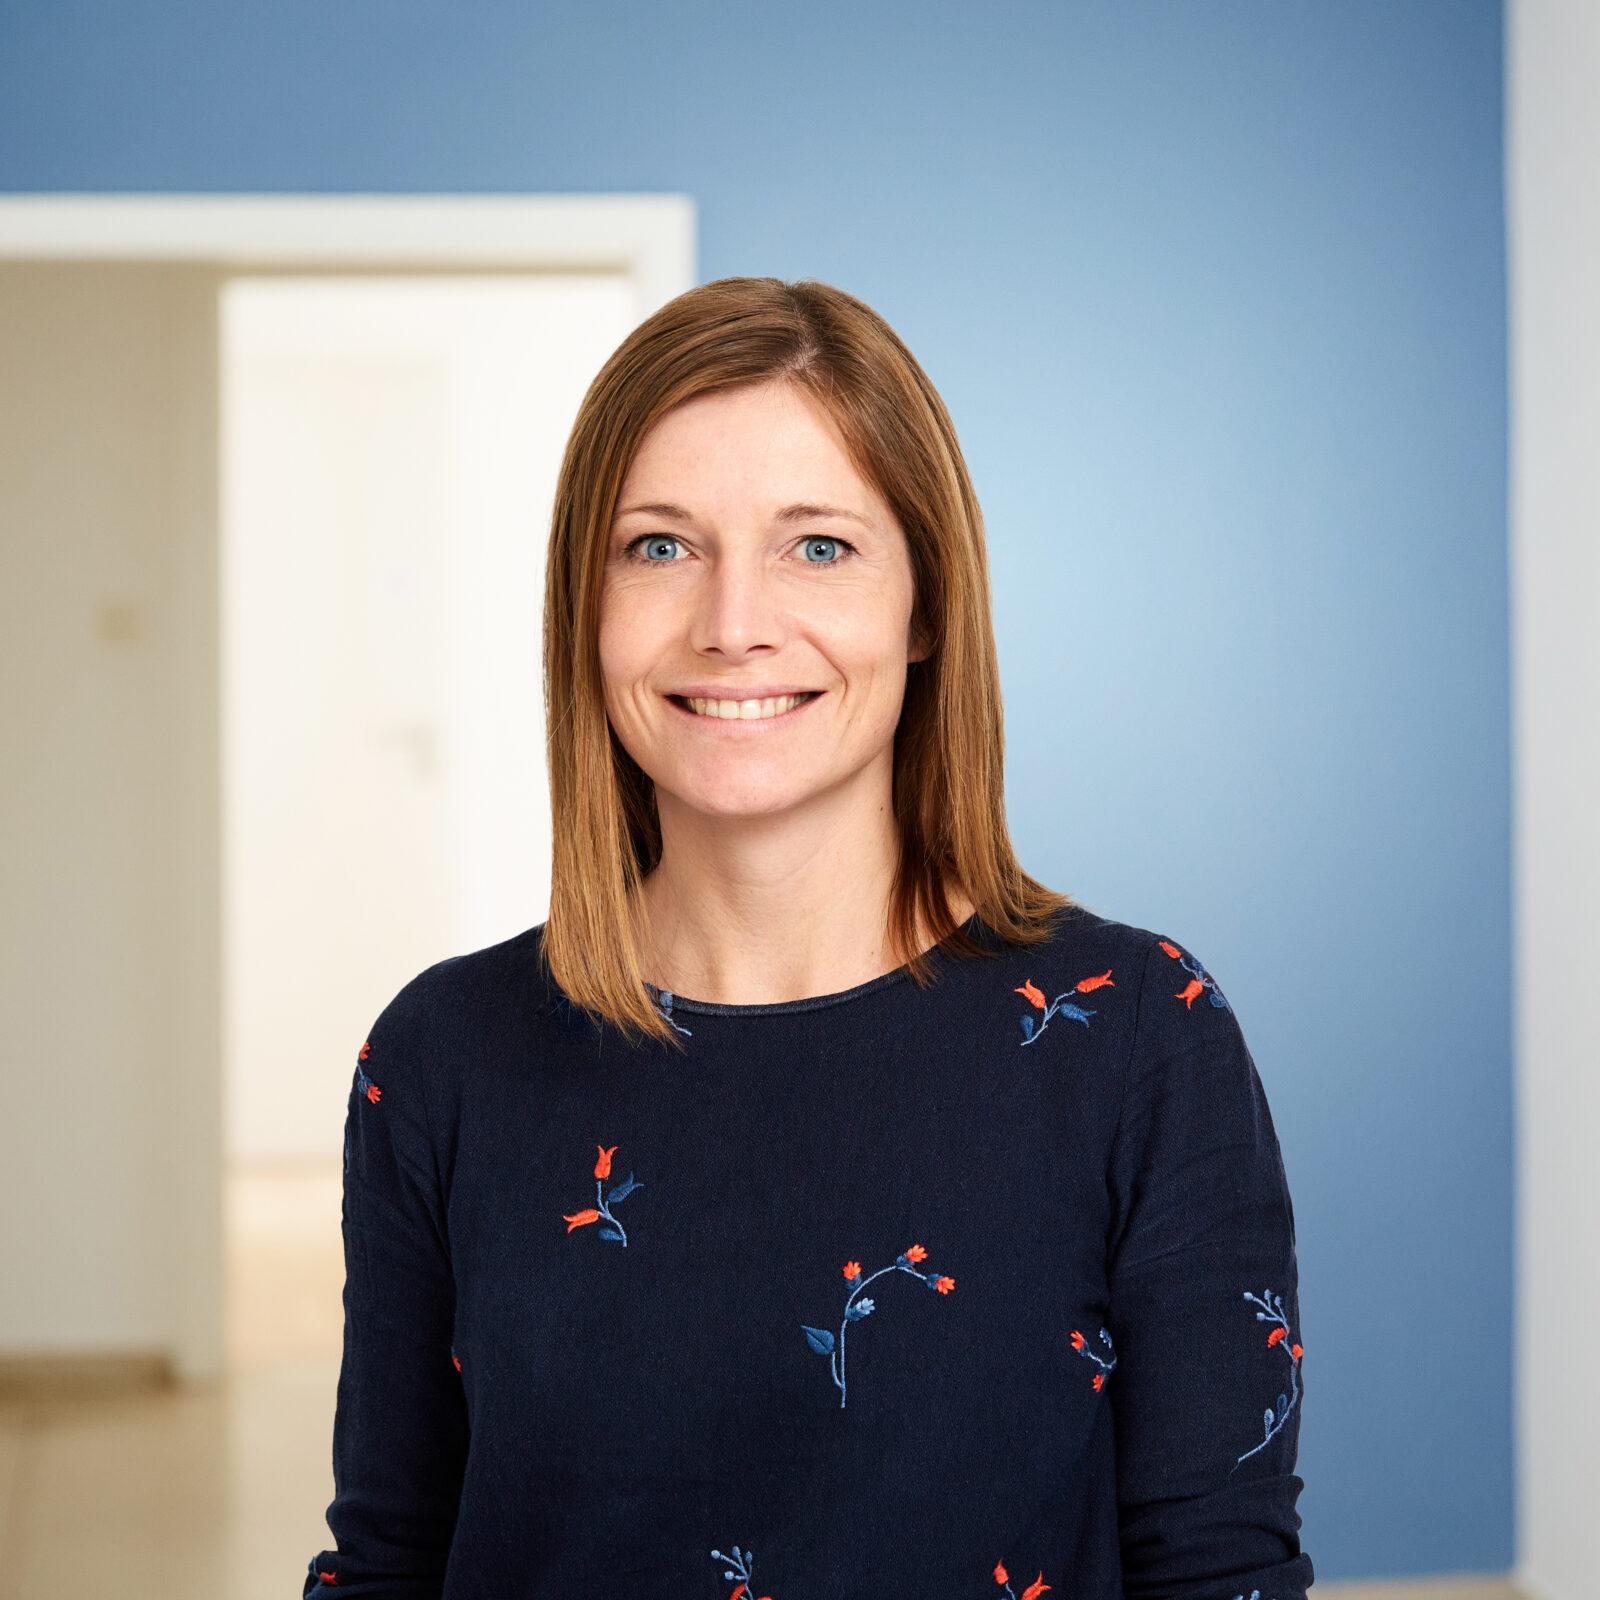 Prof. Sarah Auster, PhD